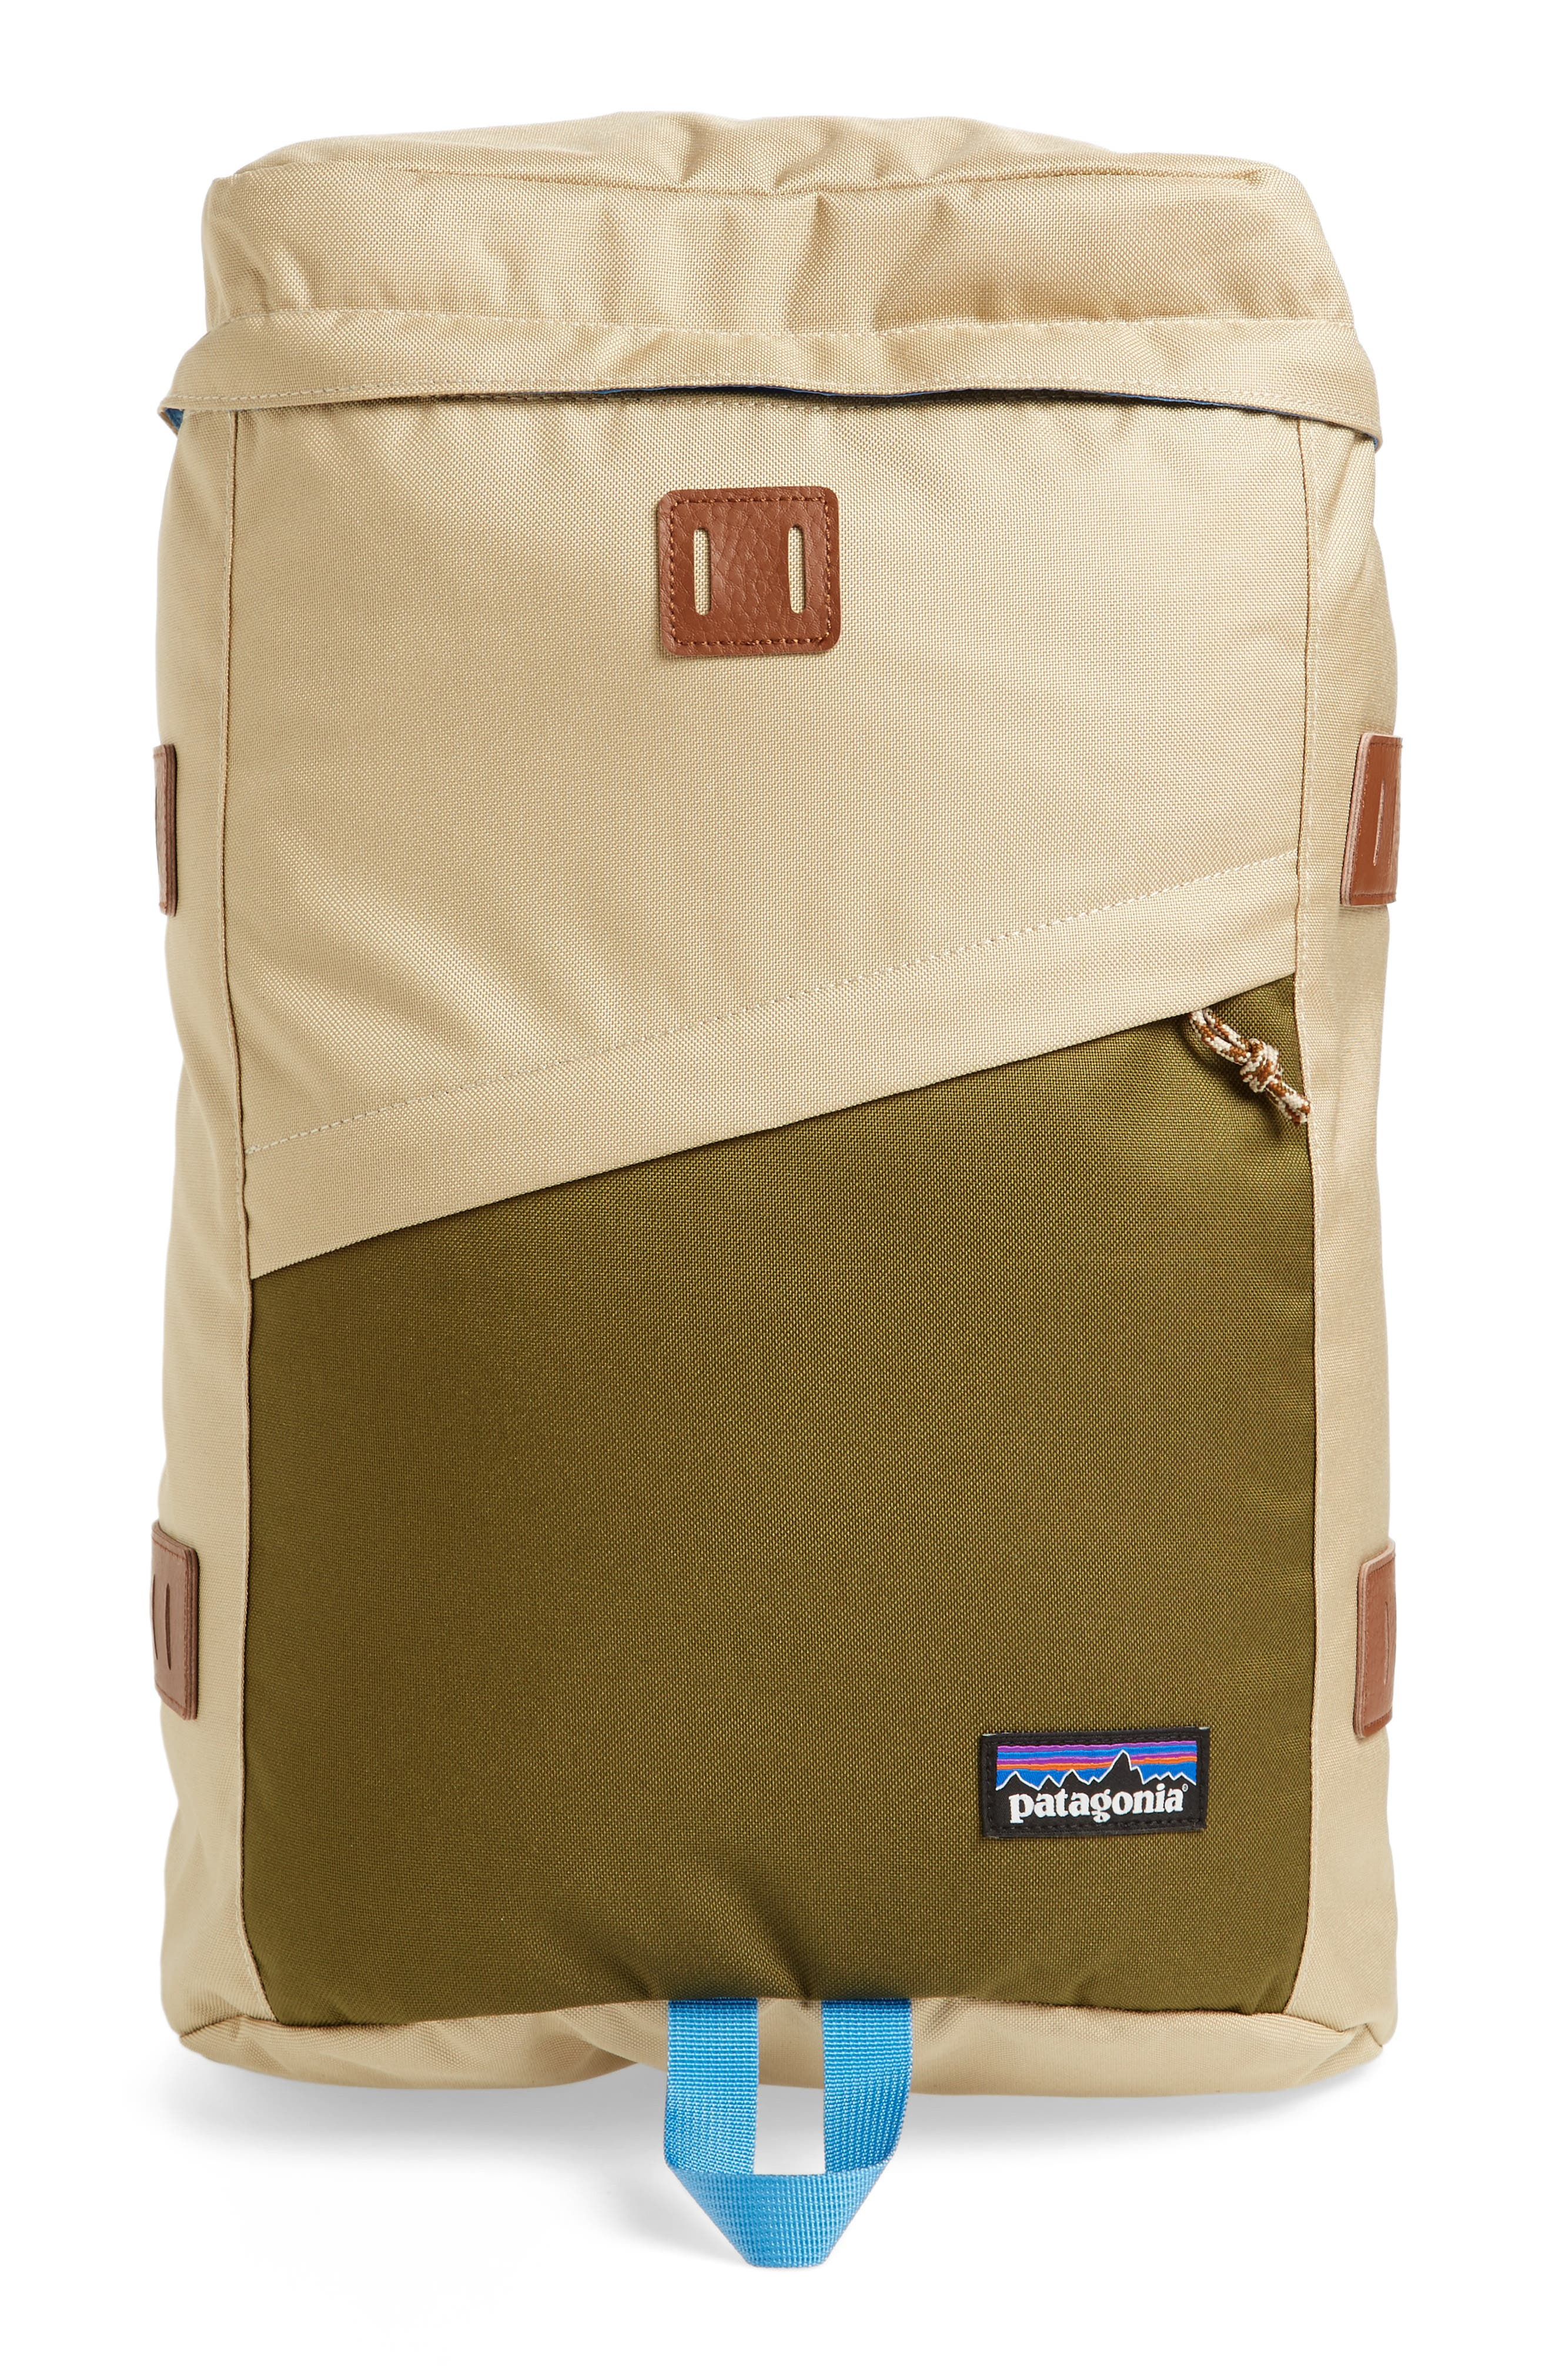 Main Image - Patagonia 'Toromiro' Backpack (22 Liter)